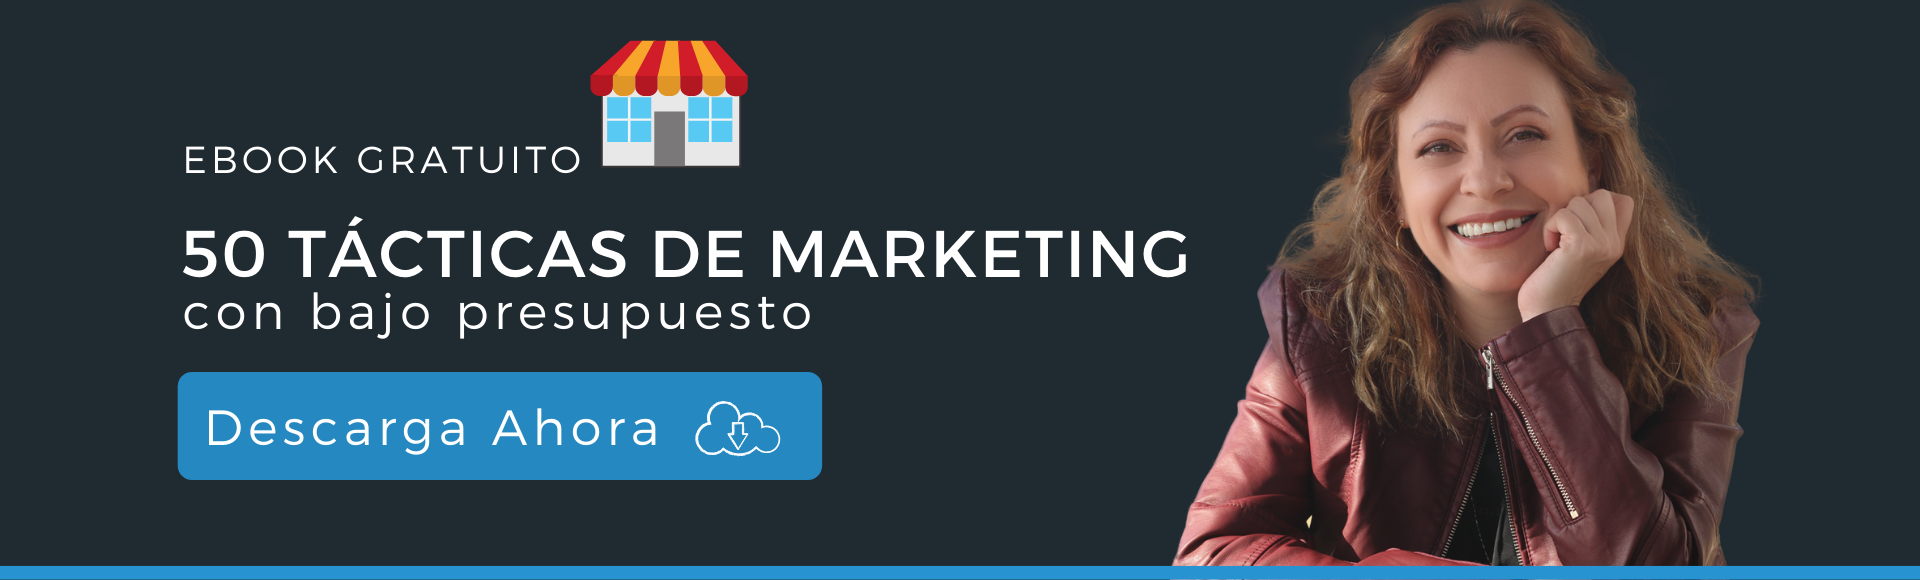 PDF_Ebook_LowCost_Marketing_01